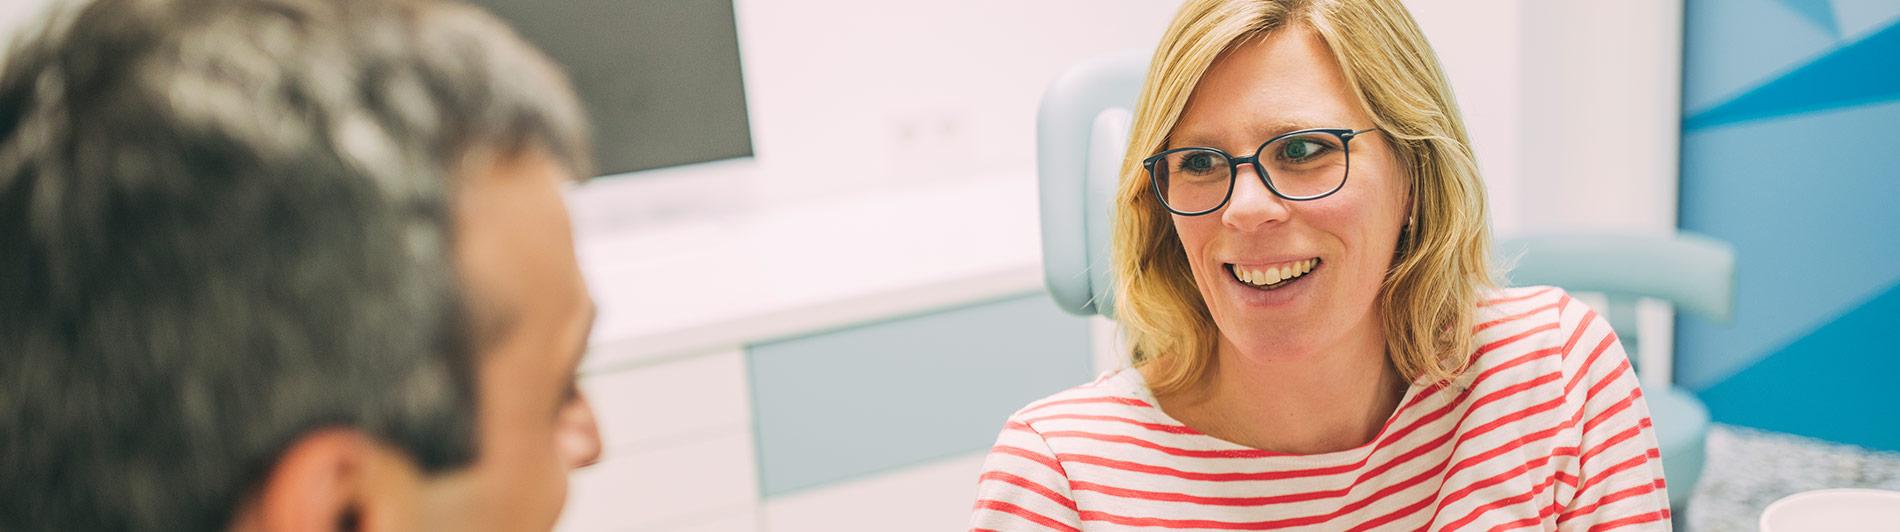 Zahnarzt Münster Paradontologie Vorsorge